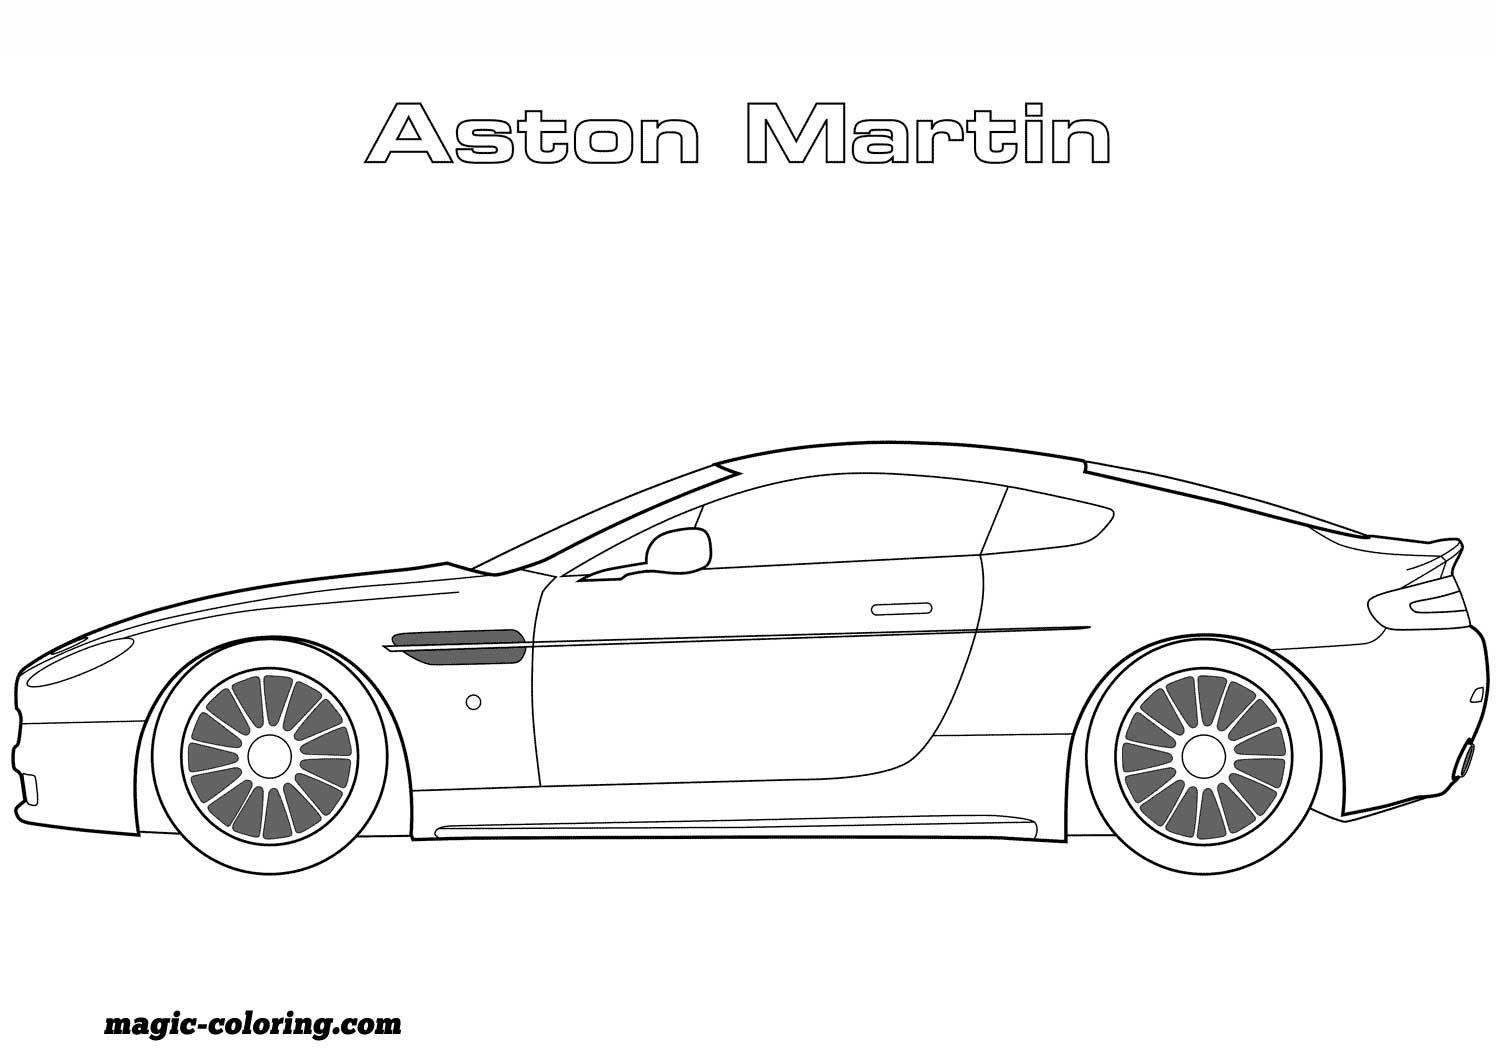 Aston Martin Super Coloring Sports Coloring Pages Coloring Pages Disney Coloring Pages